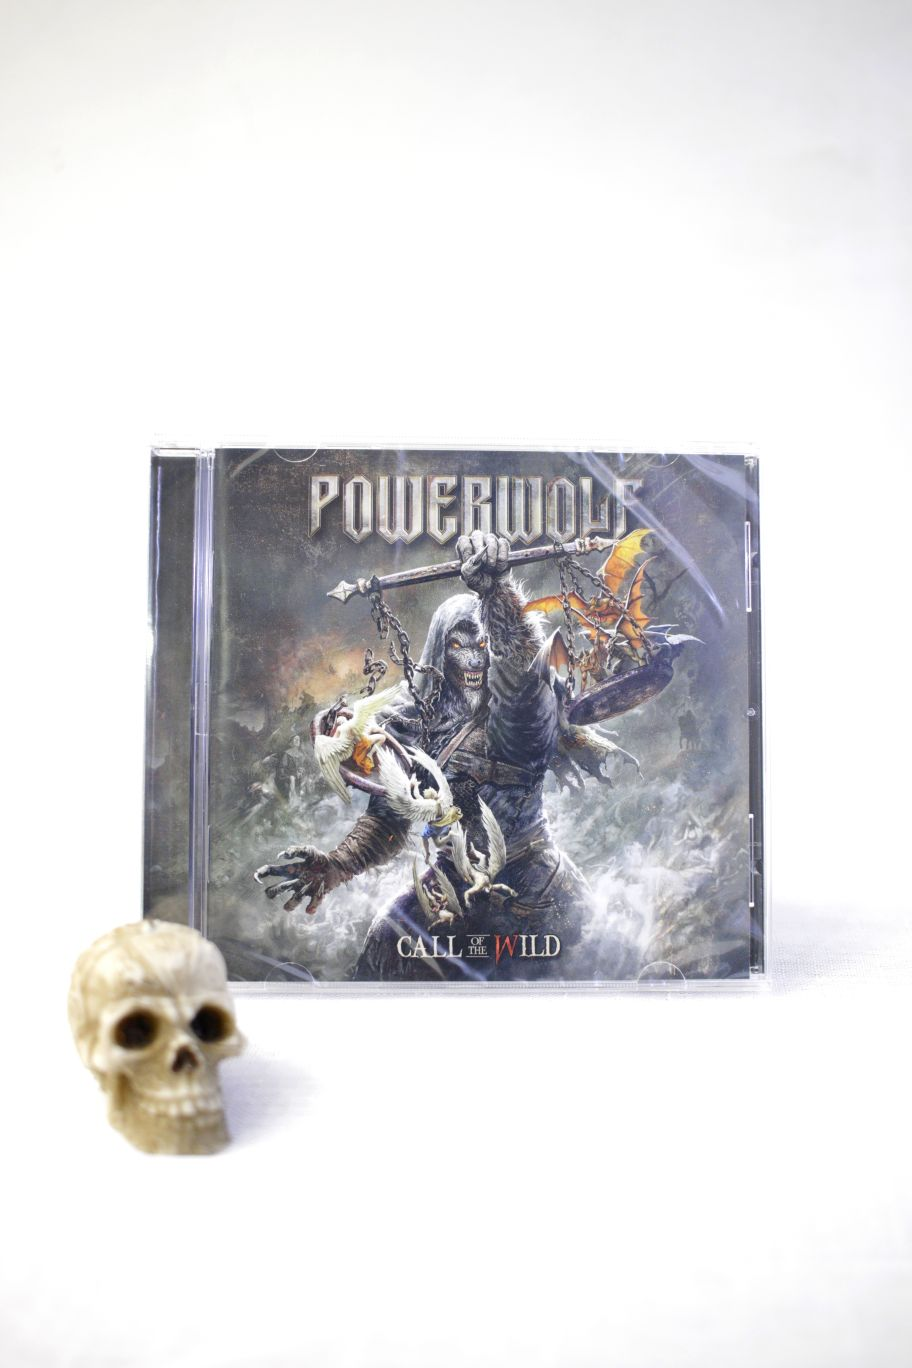 CD POWERWOLF CALL OF THE WILD